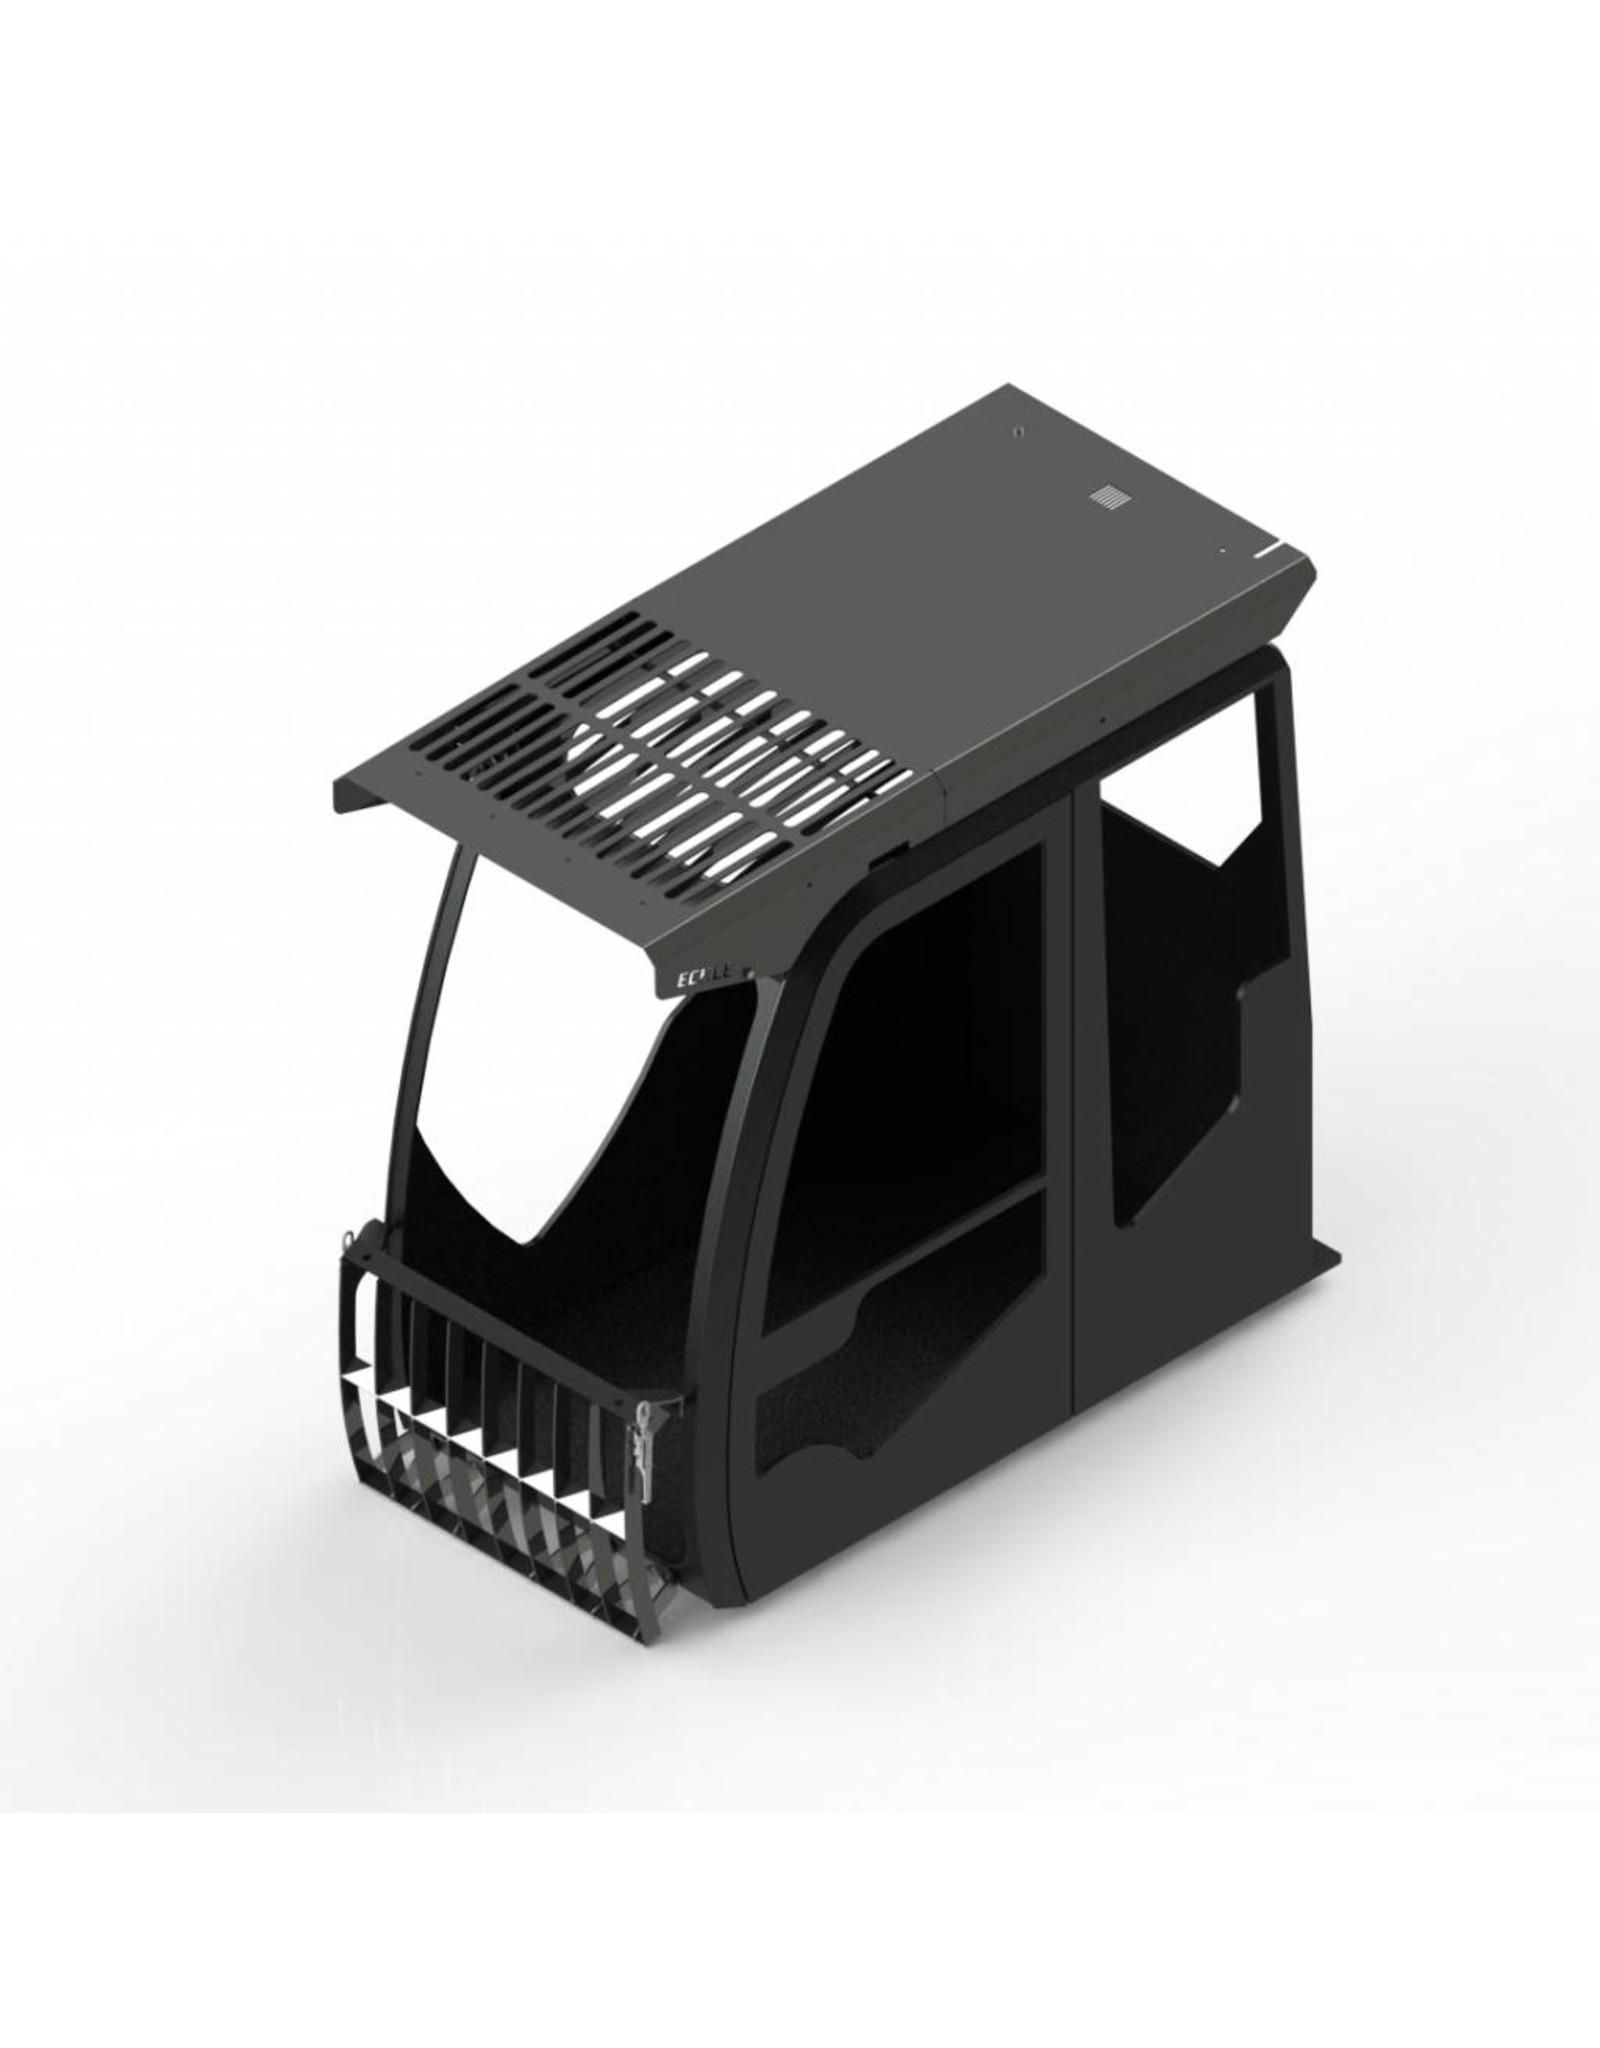 Echle Hartstahl GmbH FOPS for Hyundai HX180L